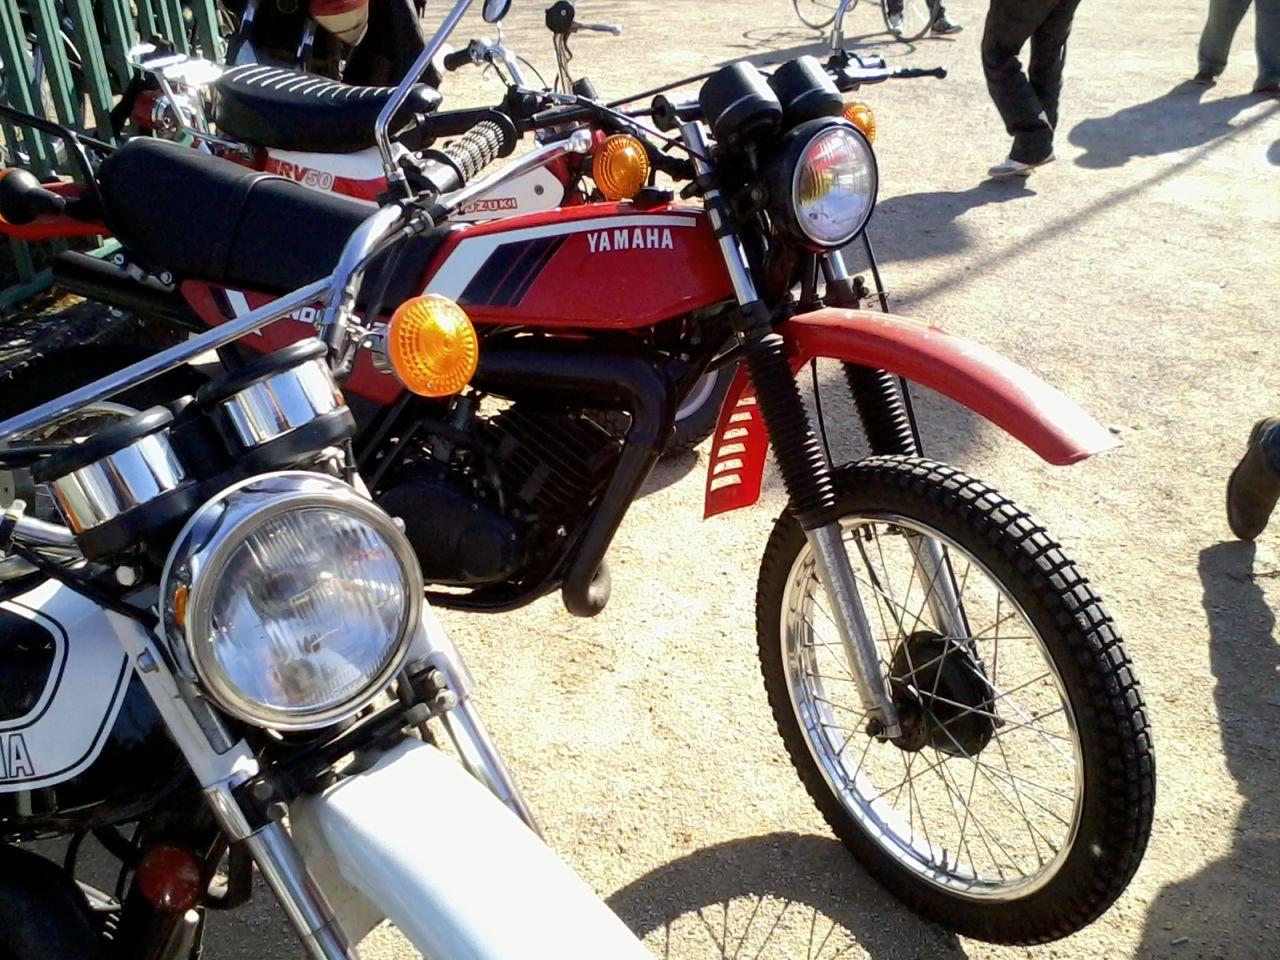 Yamaha 125, Vincennes, le 5 avril 2015.